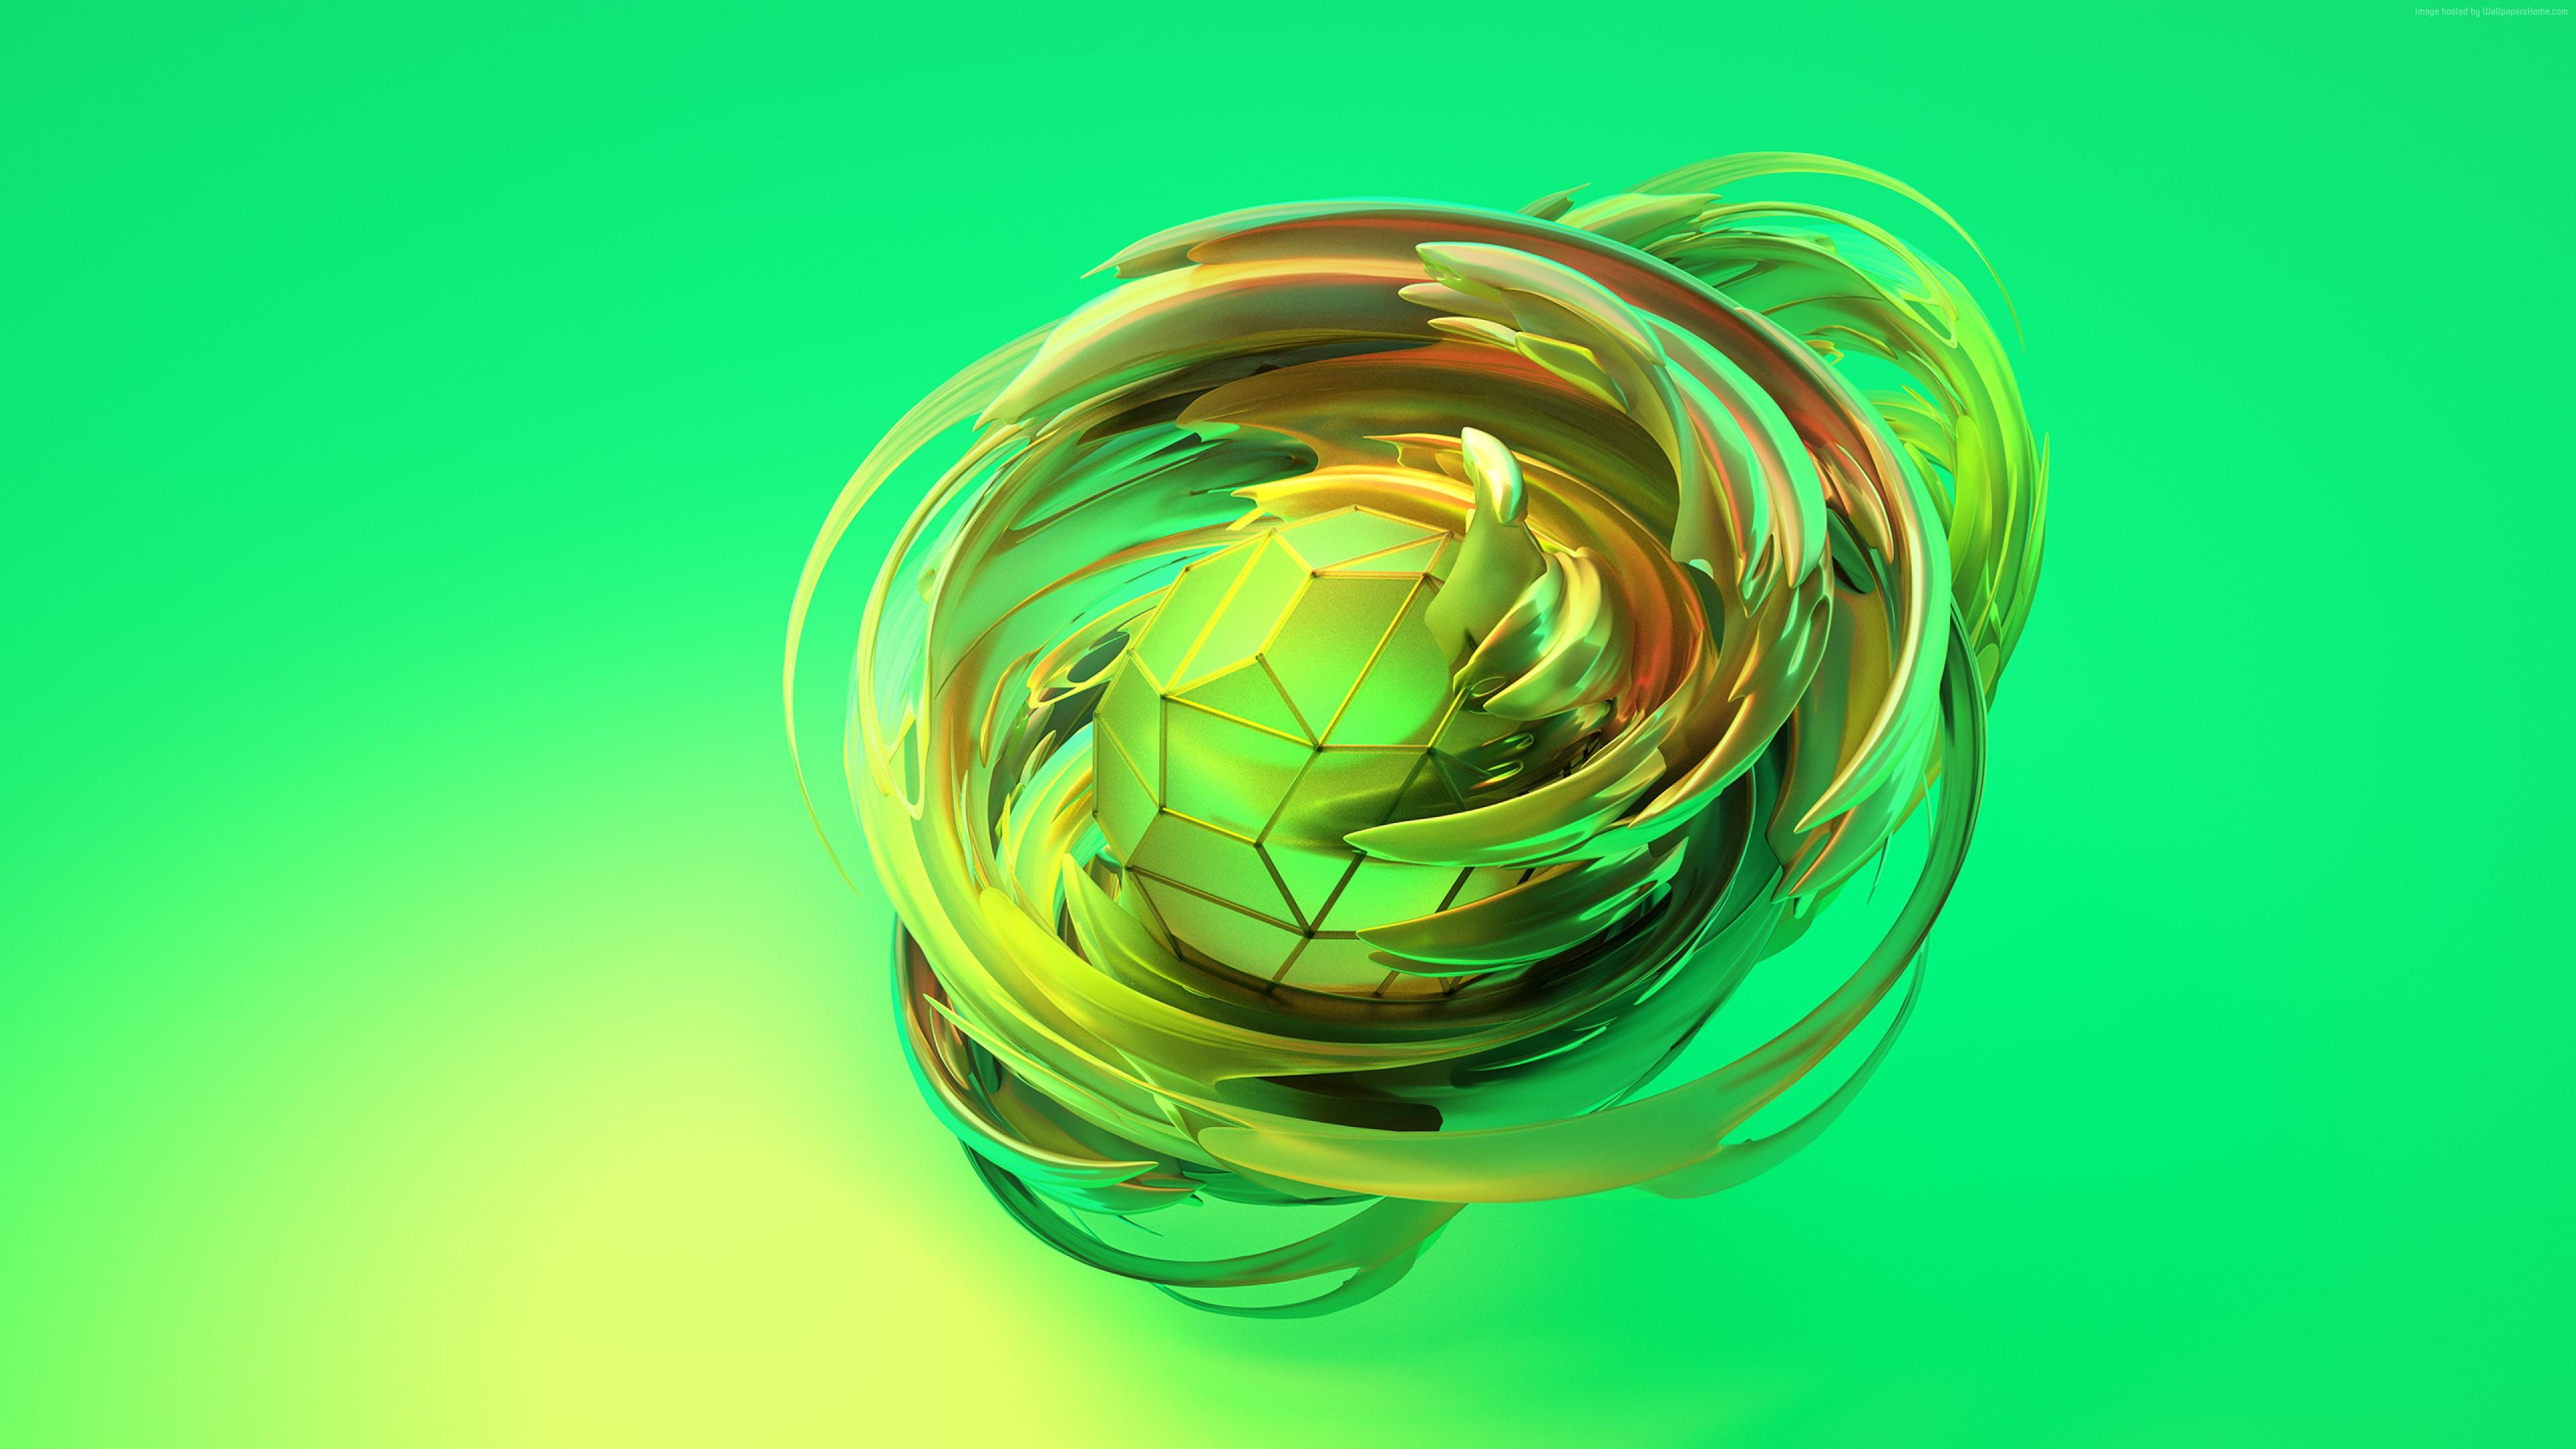 Wallpaper Apple Dreams 3d Sphere Green Hd Abstract